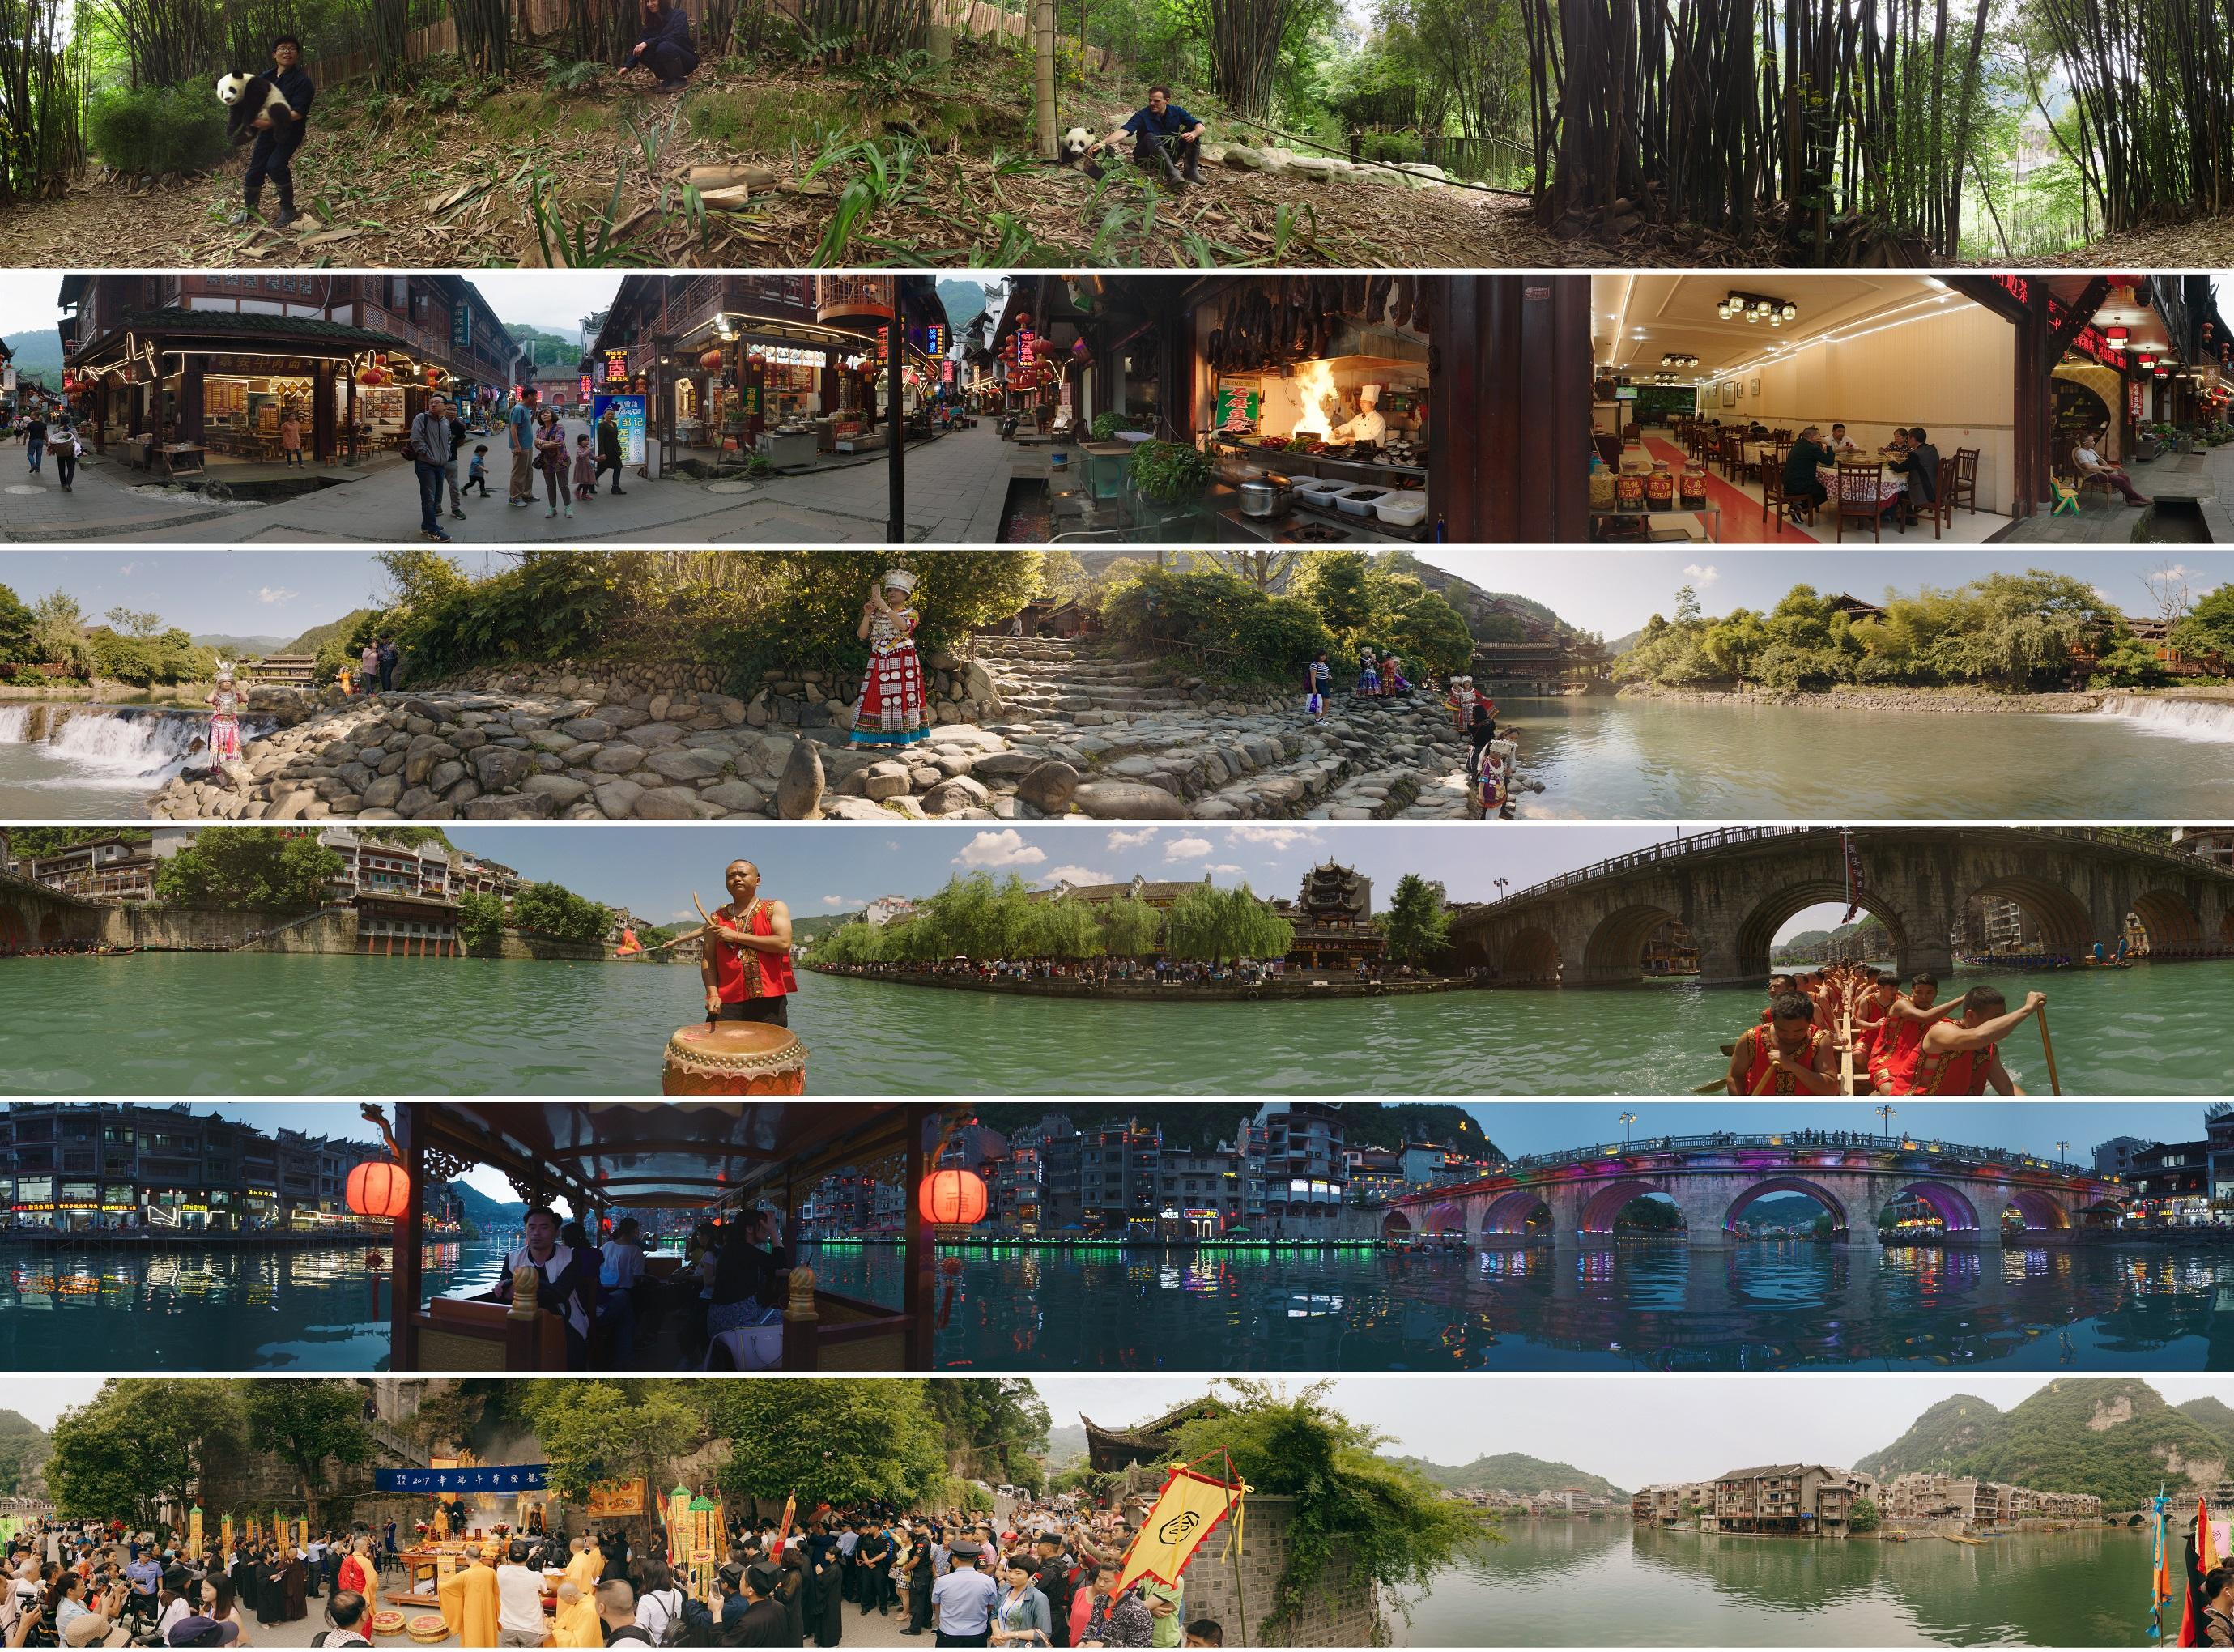 Pandarama content from ARRI